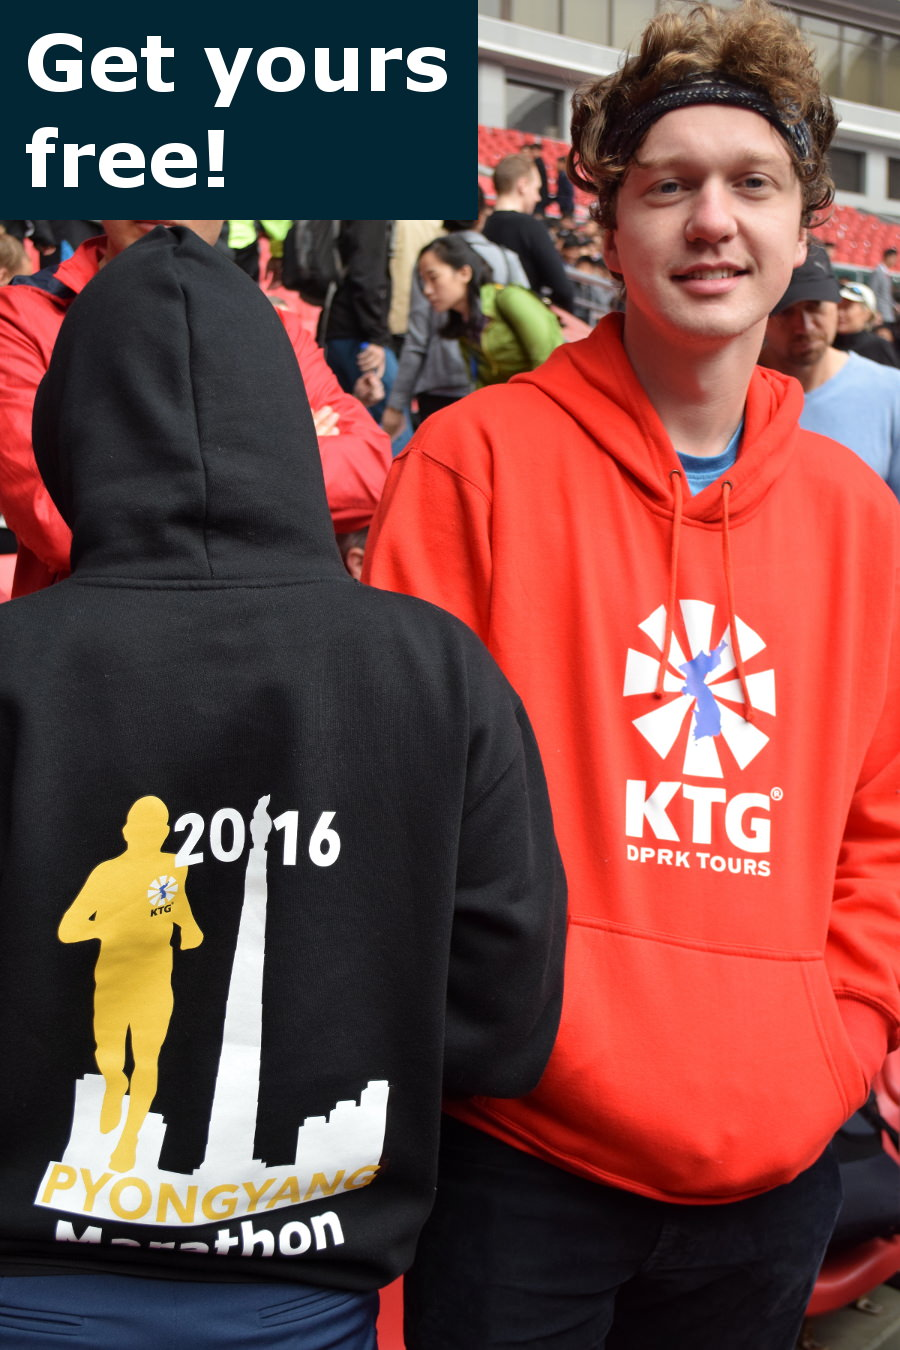 Get a free Pyongyang Marathon hoody designed by KTG